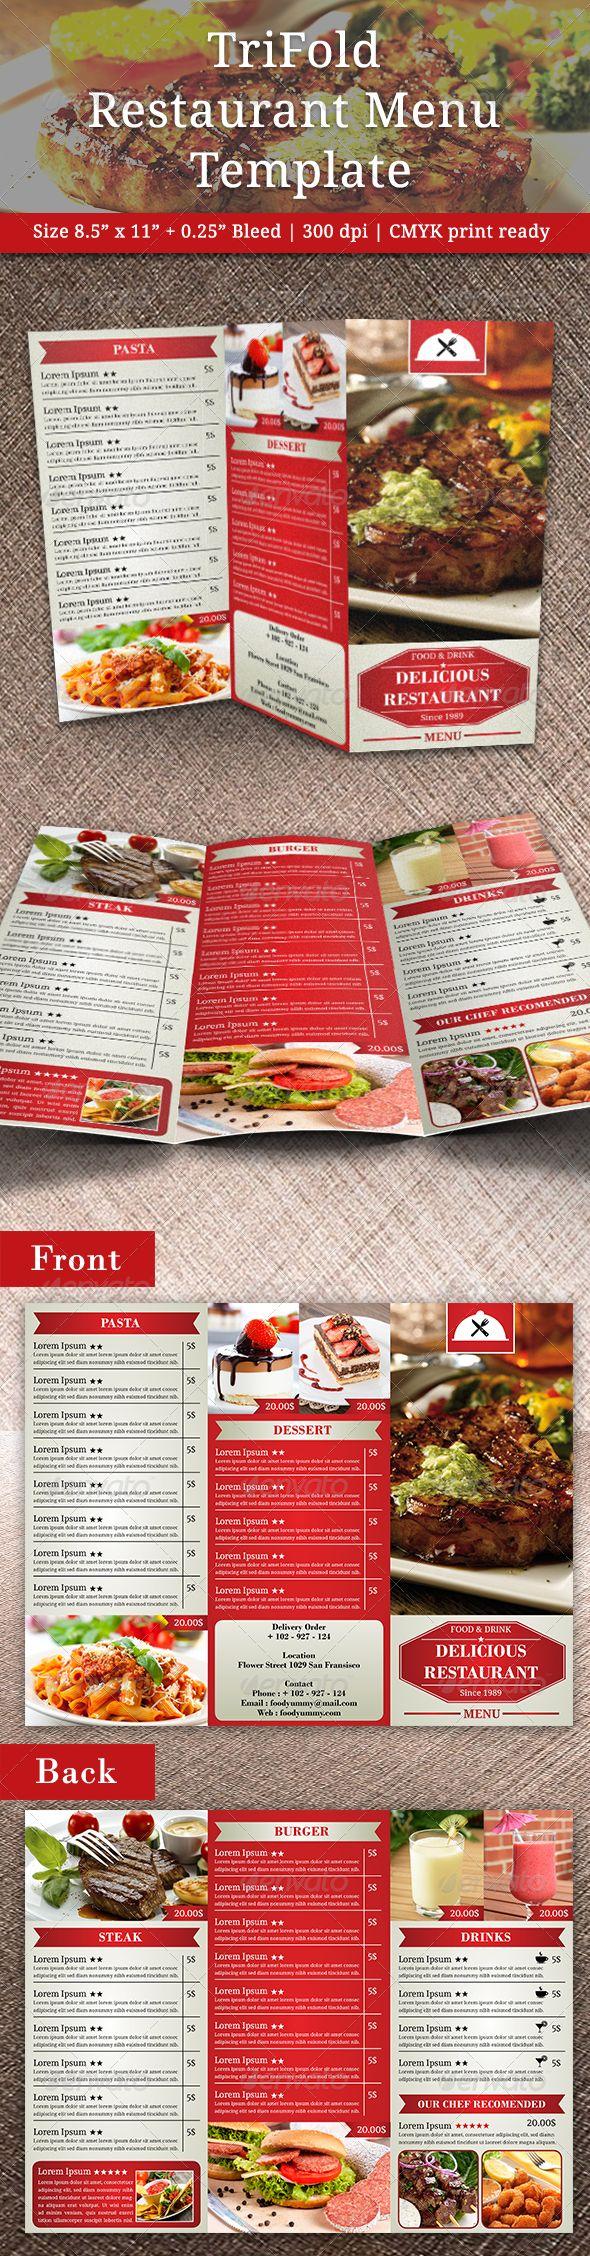 Best Menus Images On   Brochures Menu Templates And